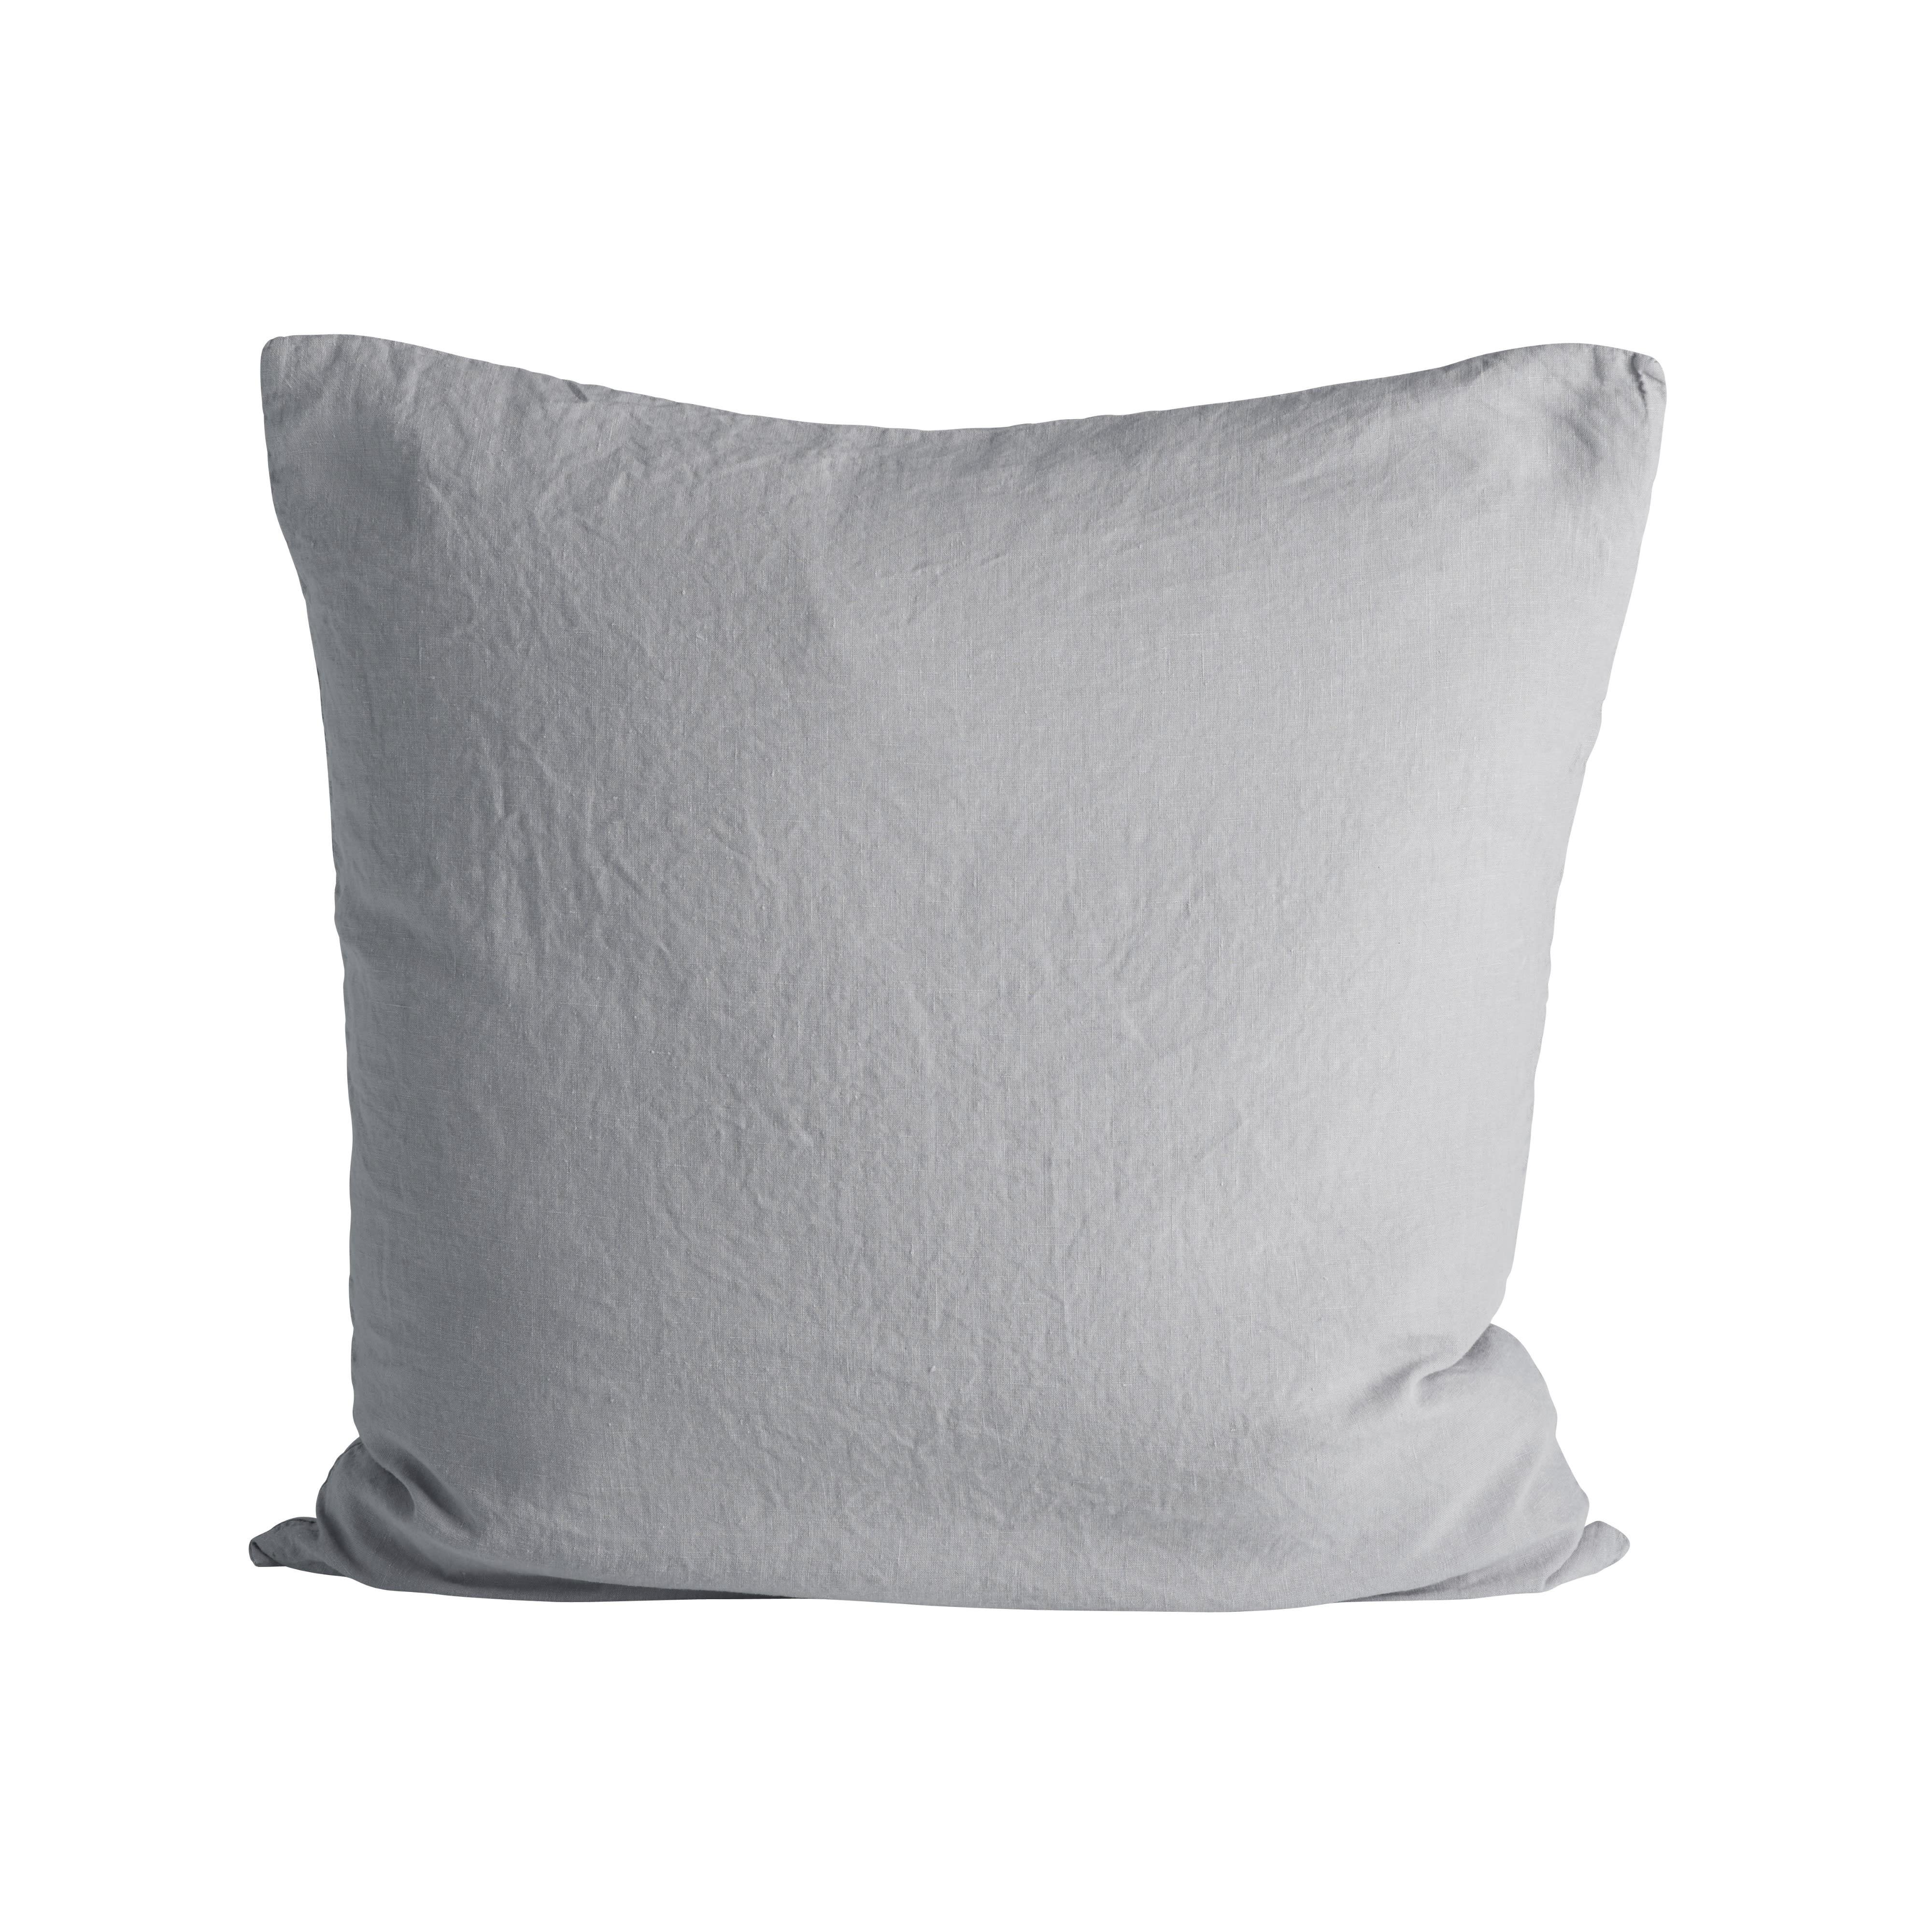 Tine K Home Mist Grey Linen Cushion